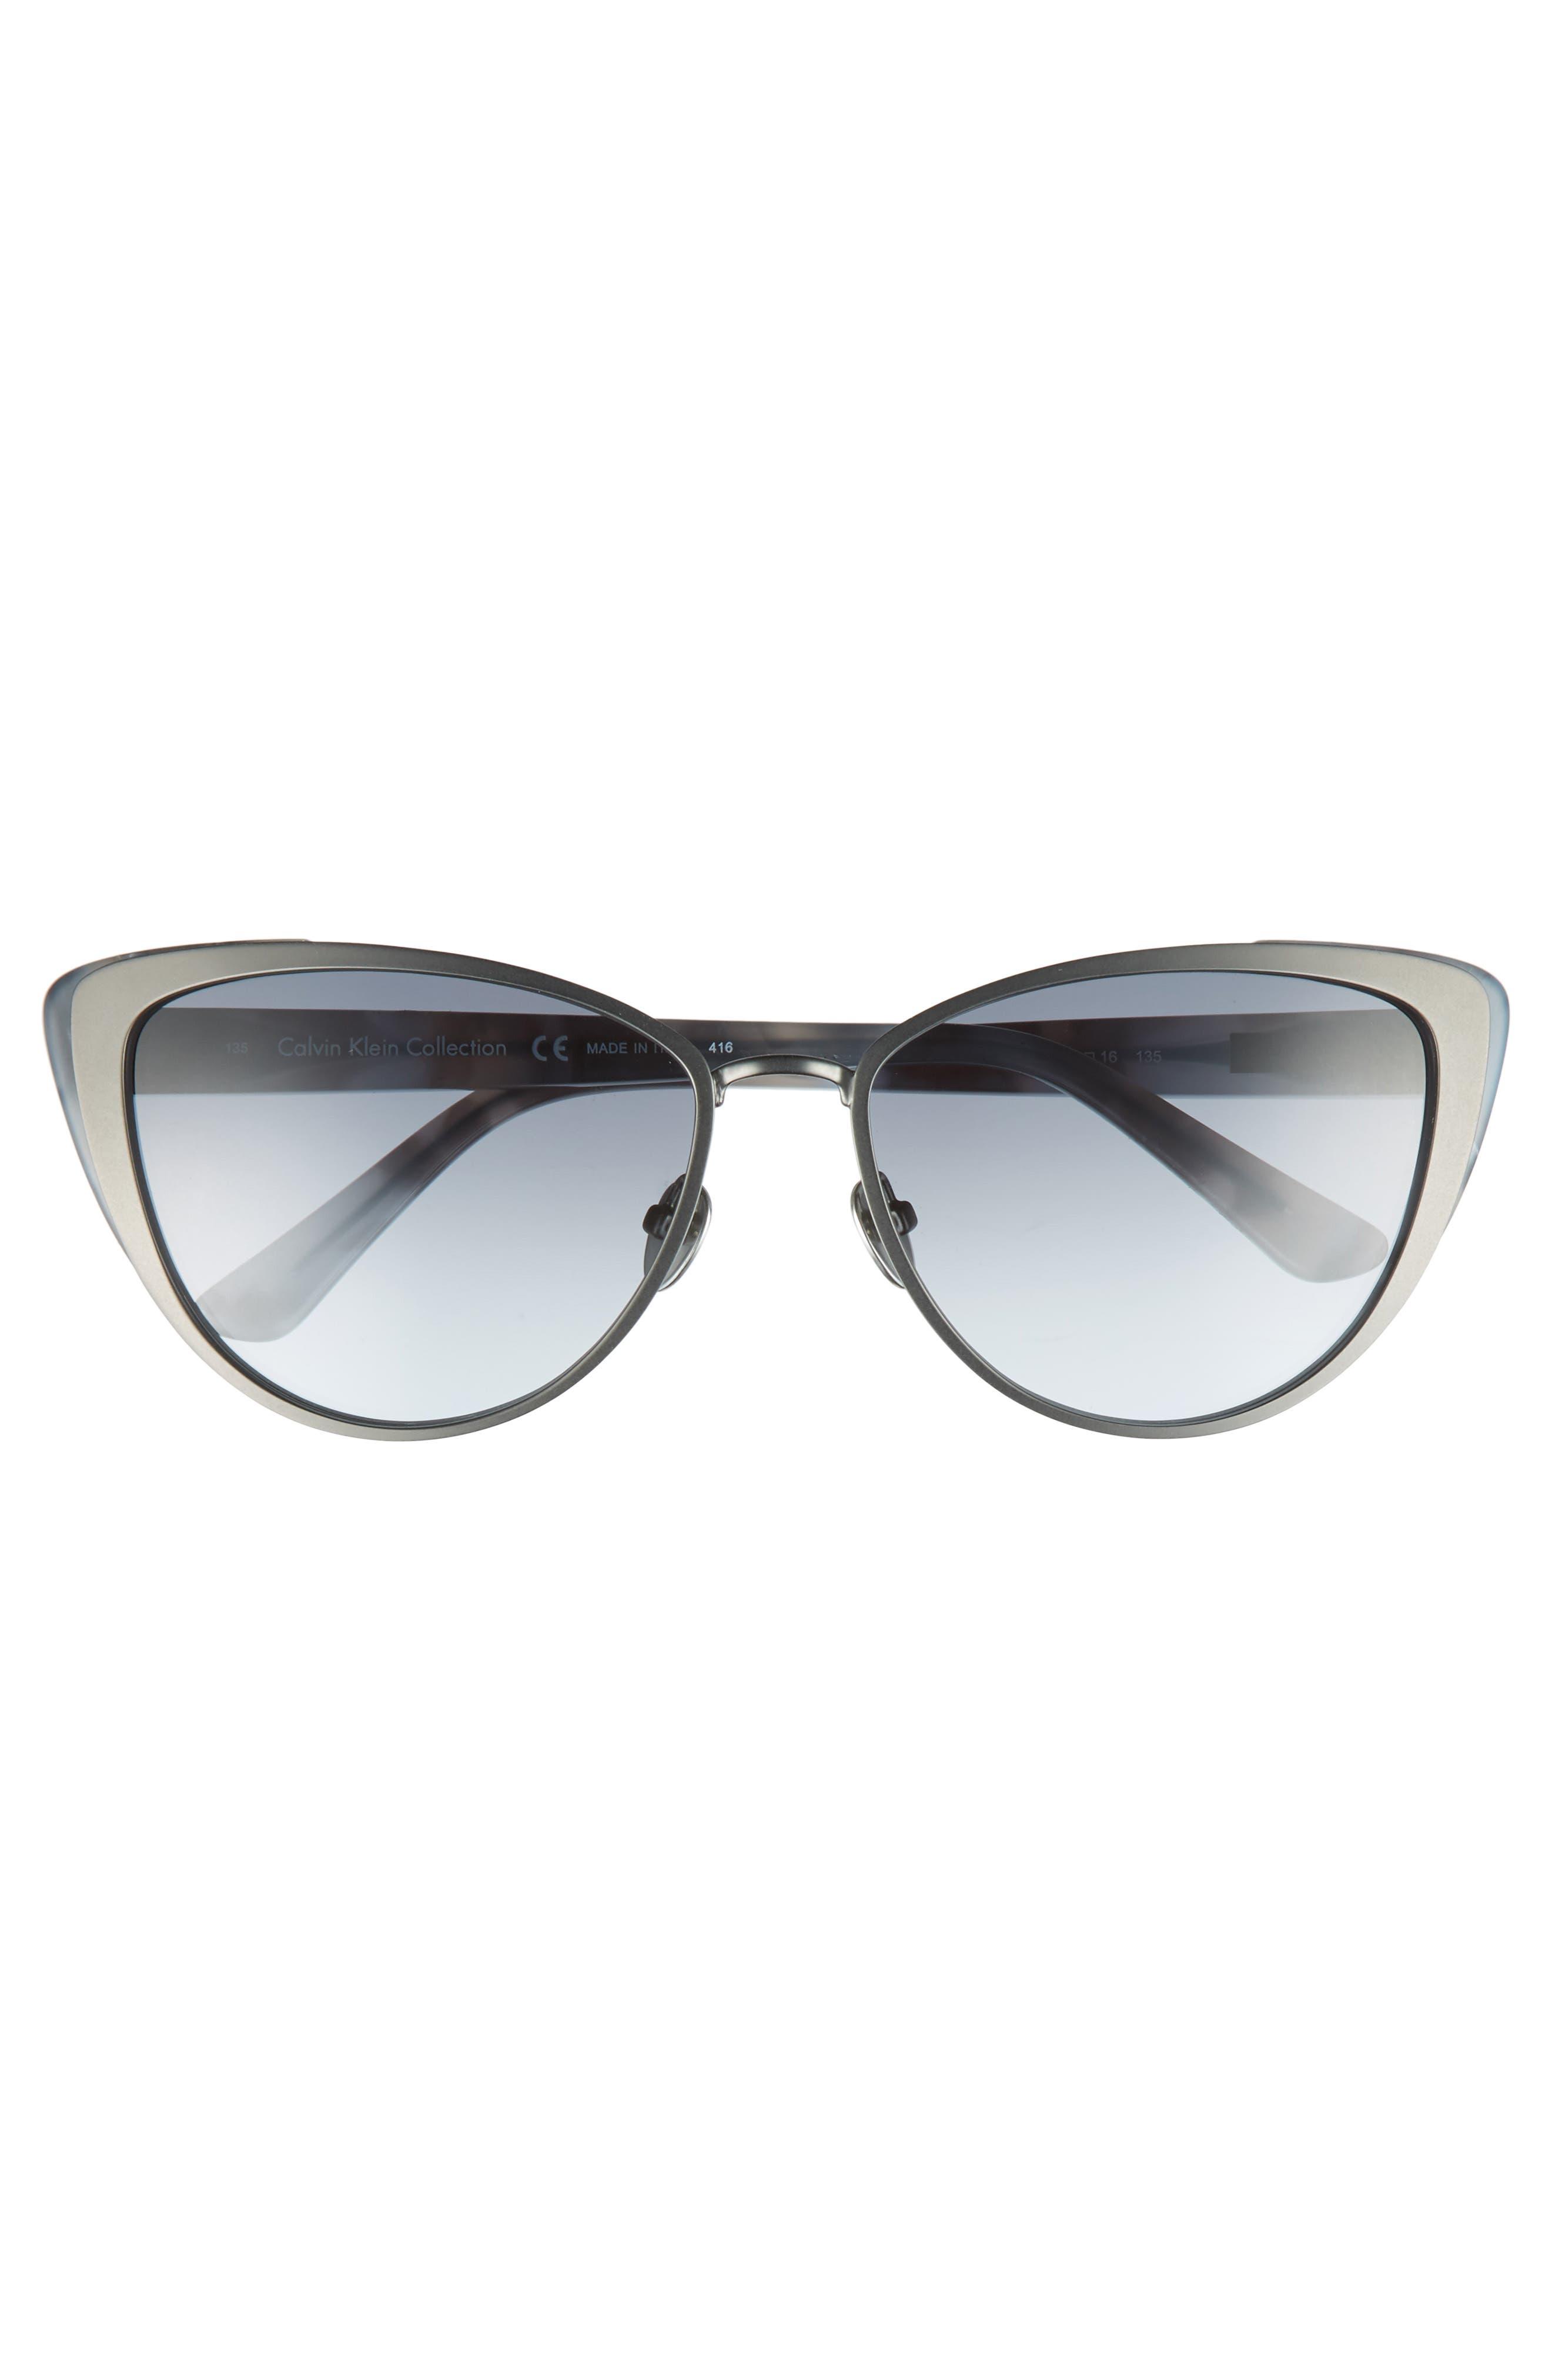 57mm Cat Eye Sunglasses,                             Alternate thumbnail 3, color,                             040